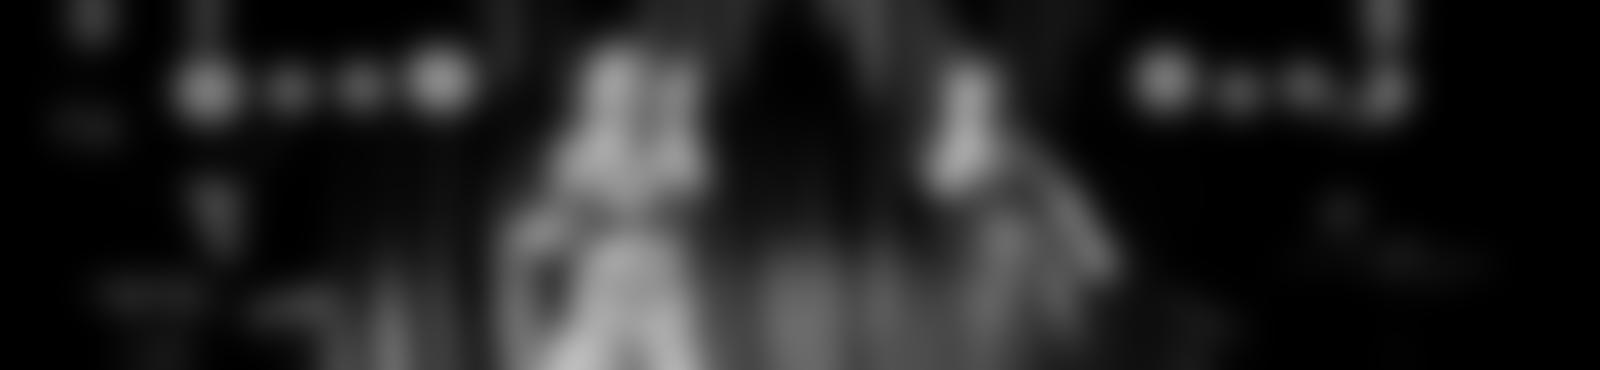 Blurred 2198dacd b3bc 4830 99e4 ed42936fcf1b